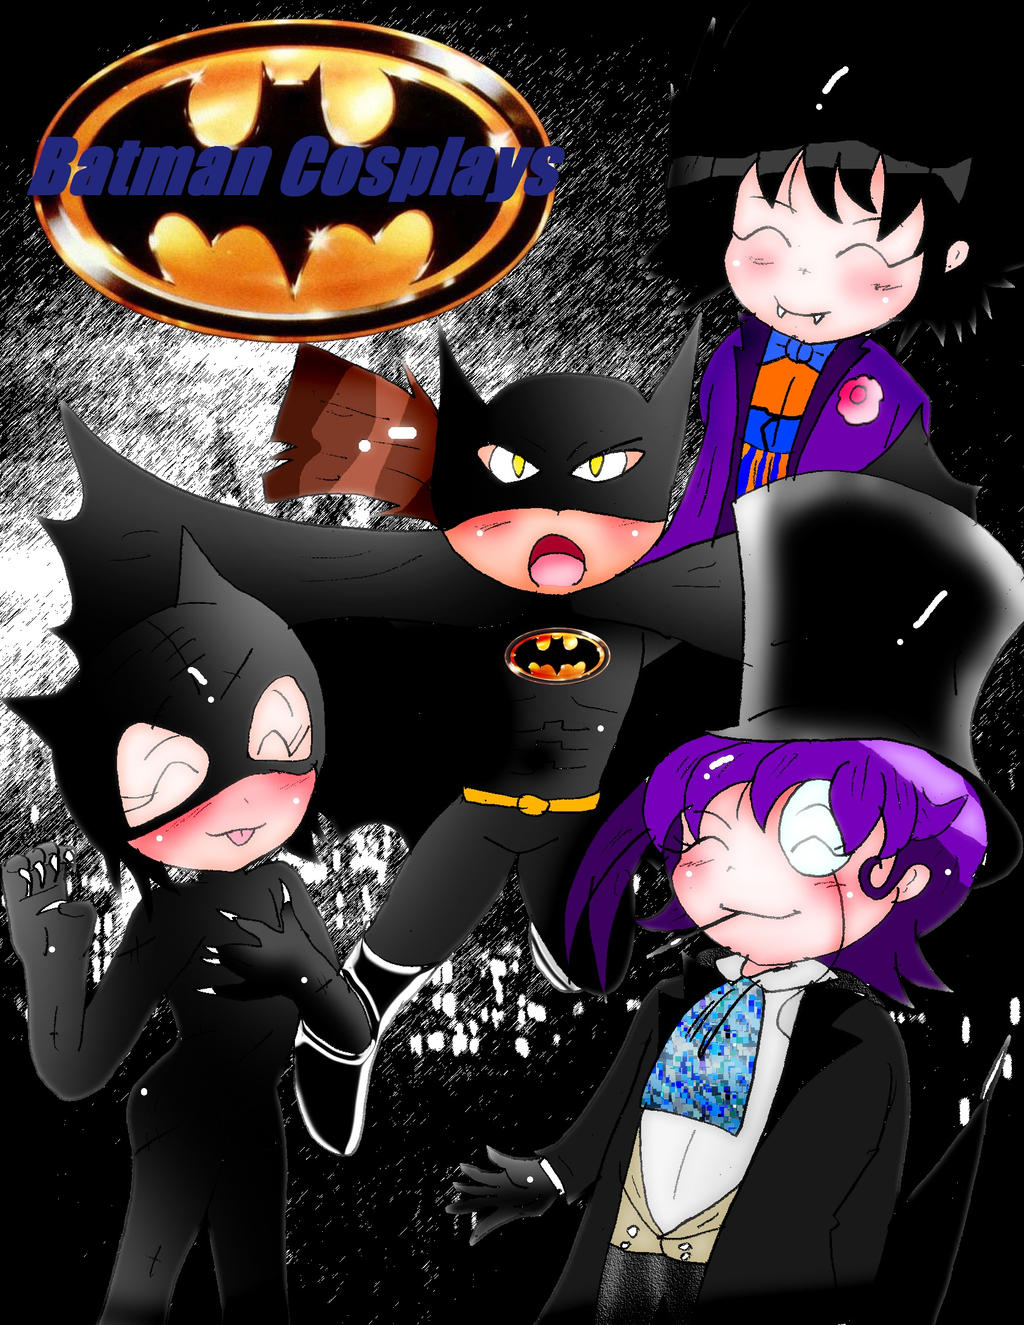 Batman Cosplays -Tim Burton- by Rokku-D